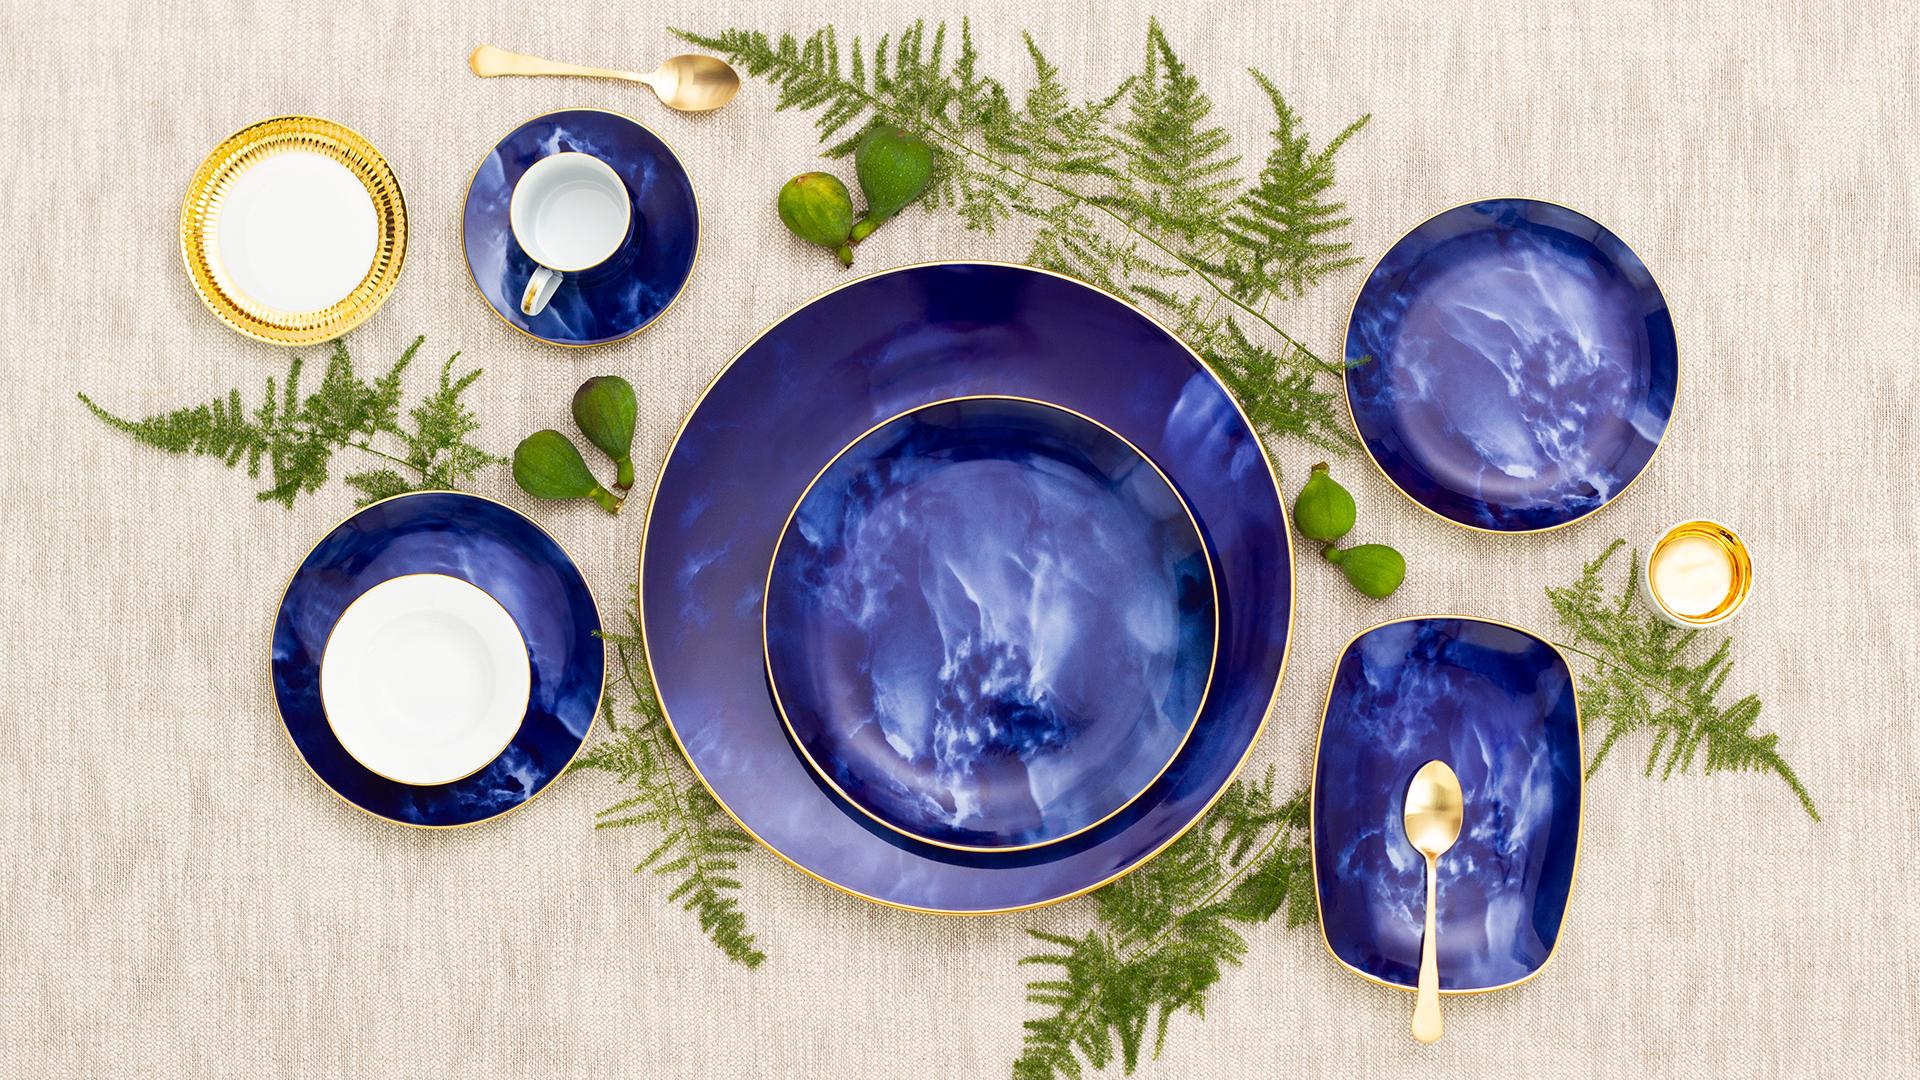 Adamastor new collections - porcel - porcelain solutions